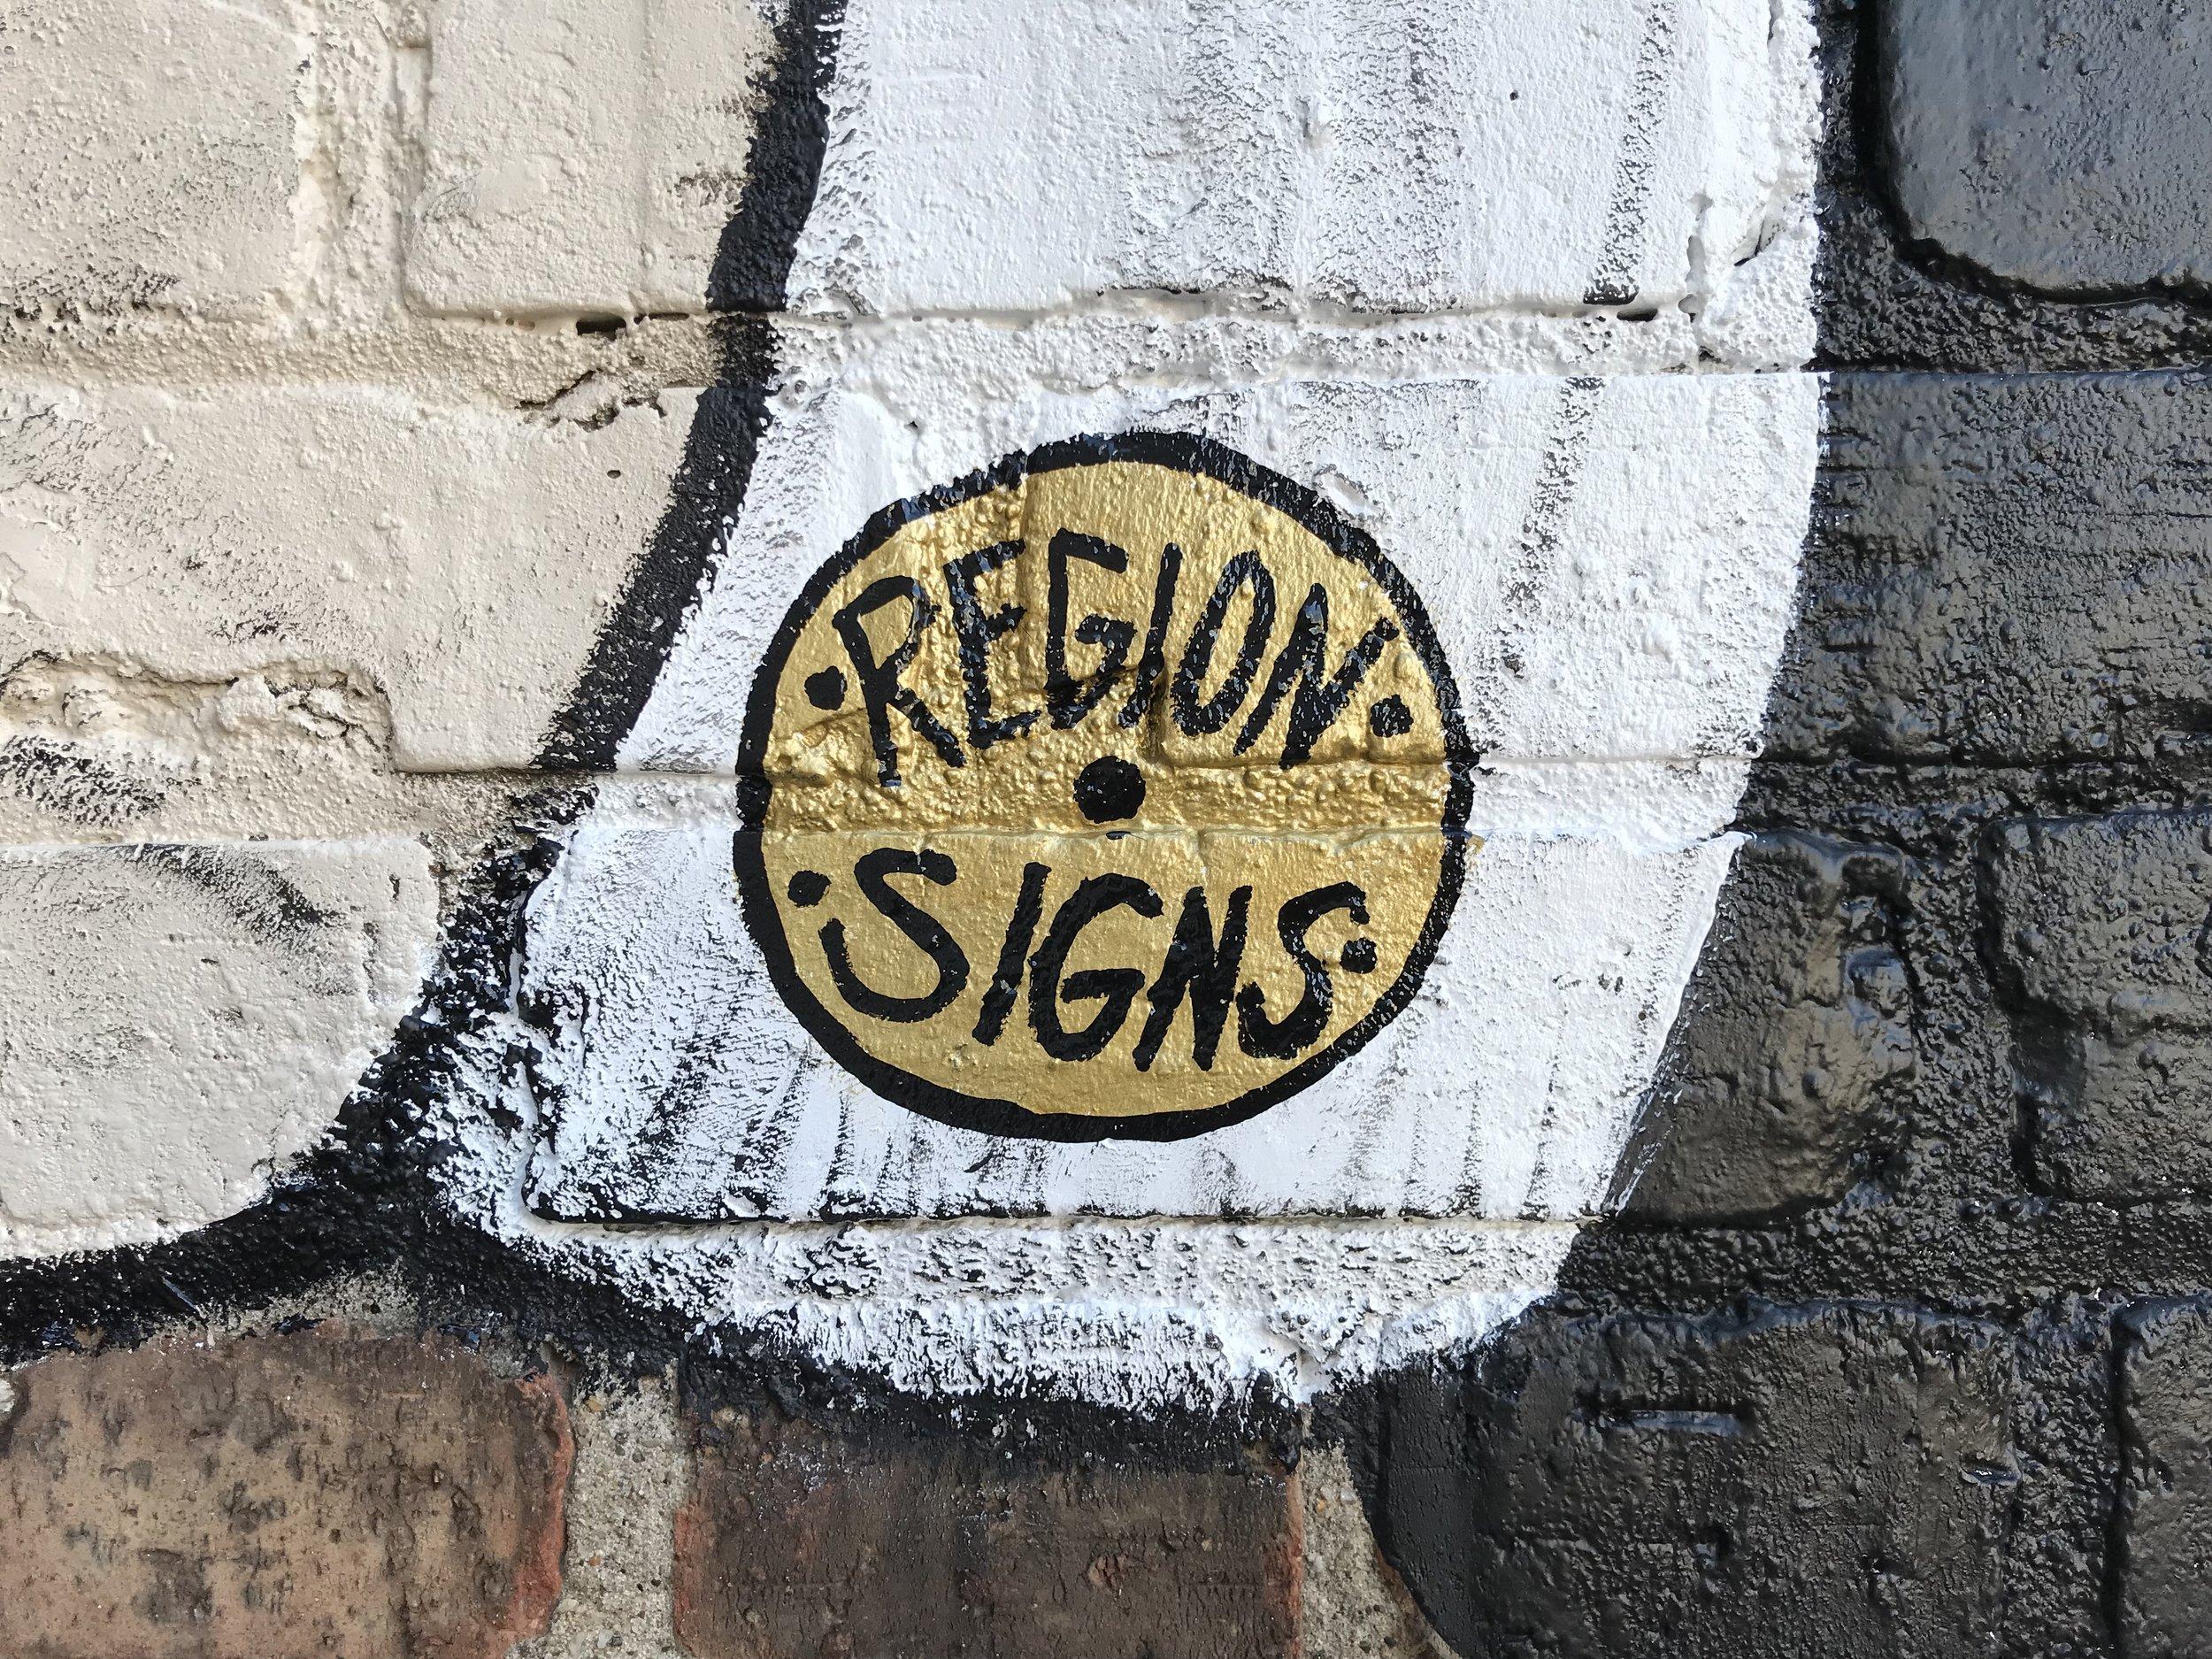 Region Signs Inc. Whiting, Indiana November 2017    http://regionsignsinc.com/